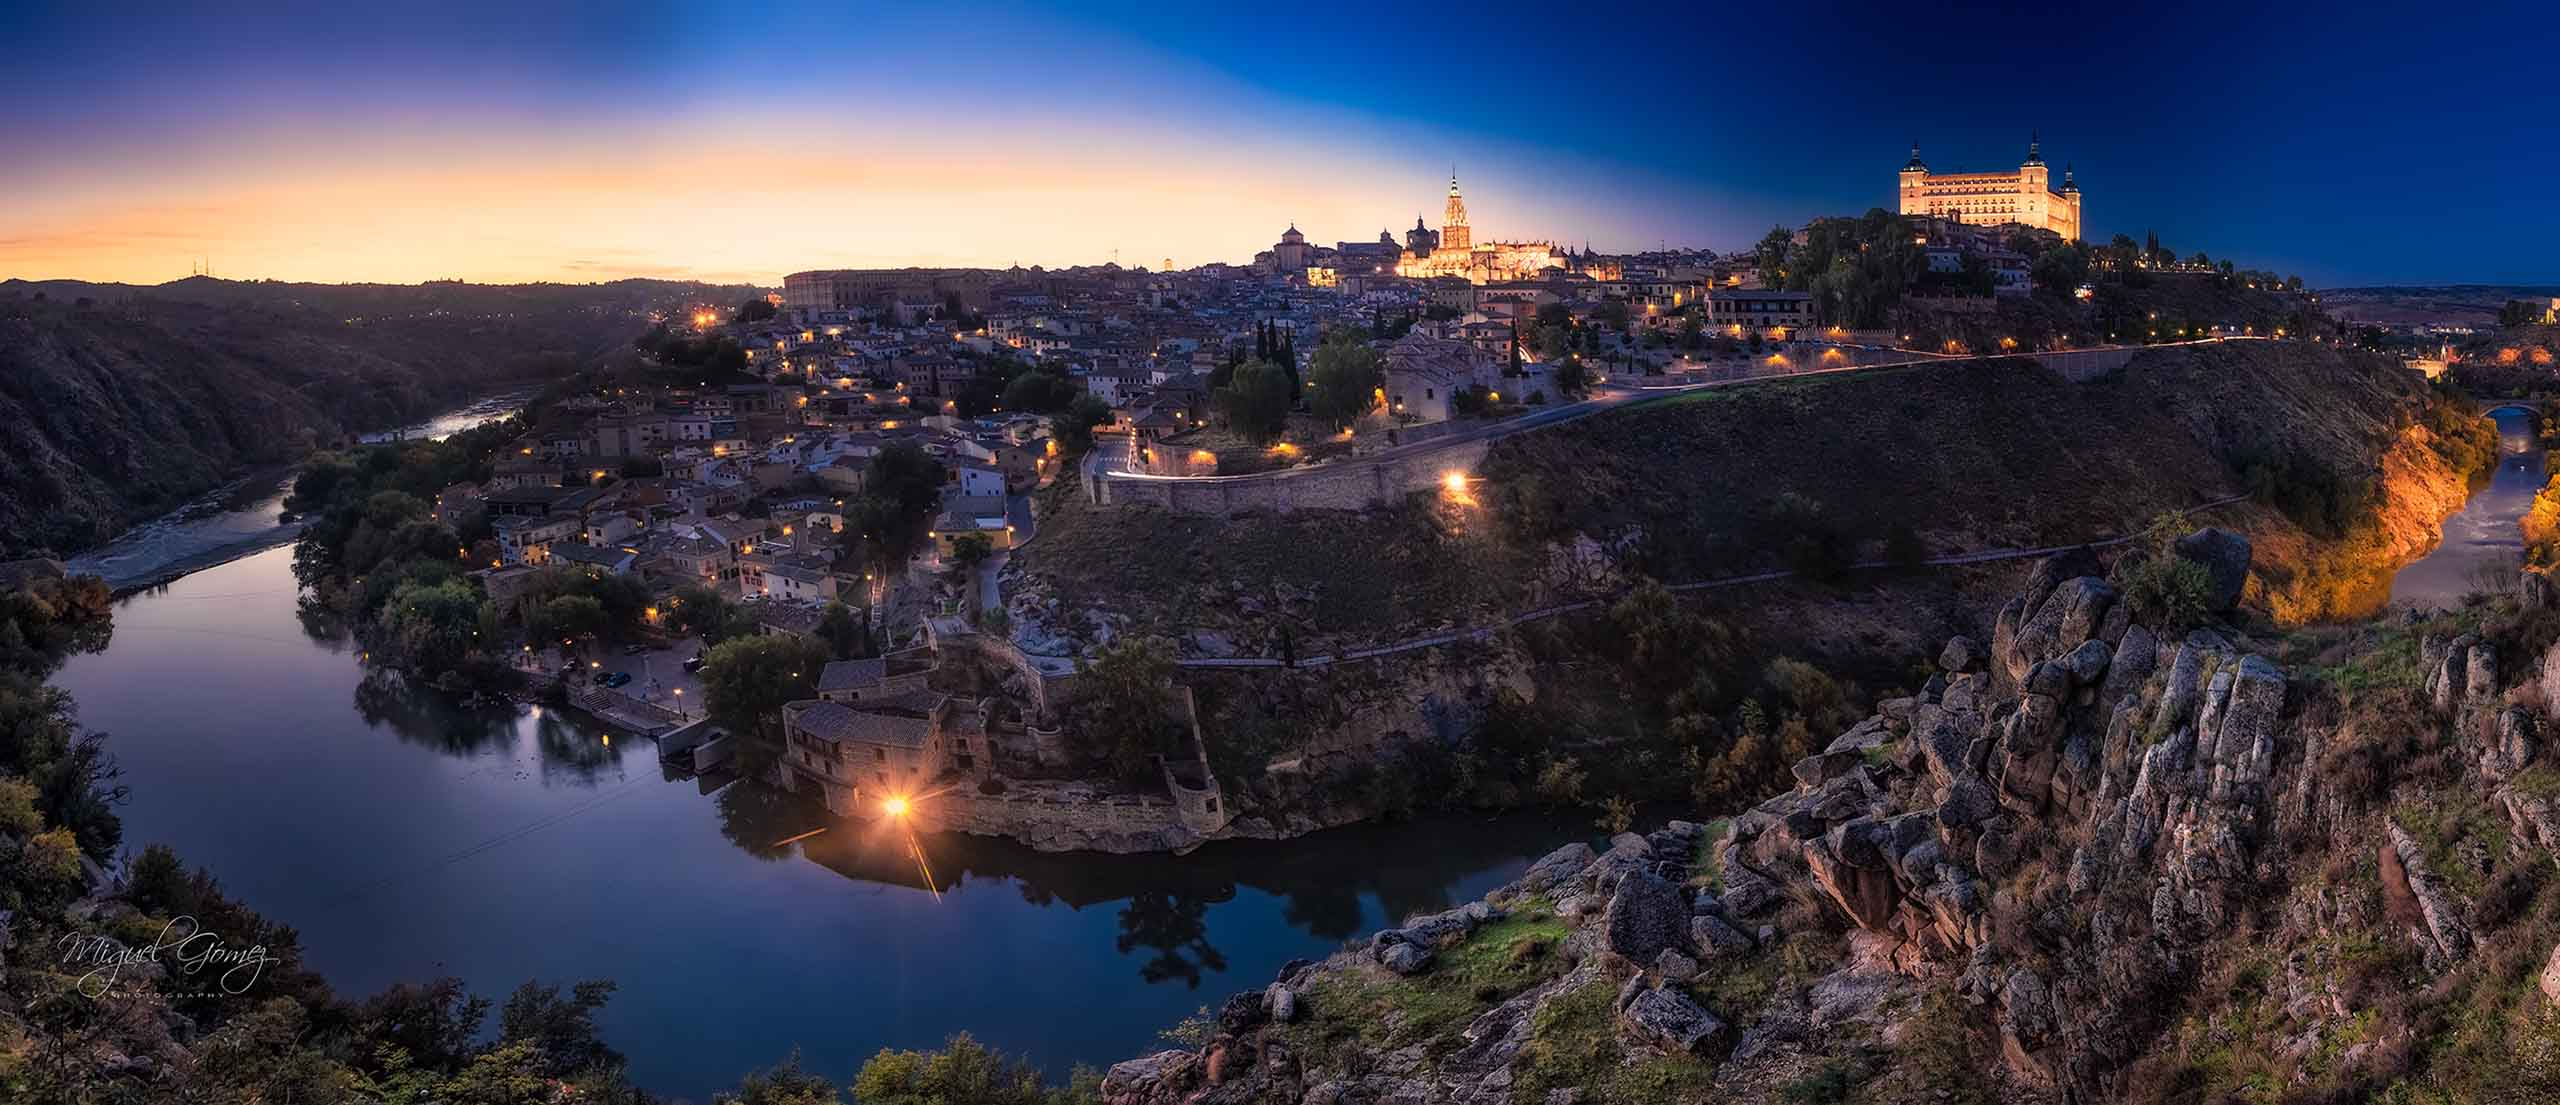 Slider - Paisaje urbano de la ciudad de Toledo